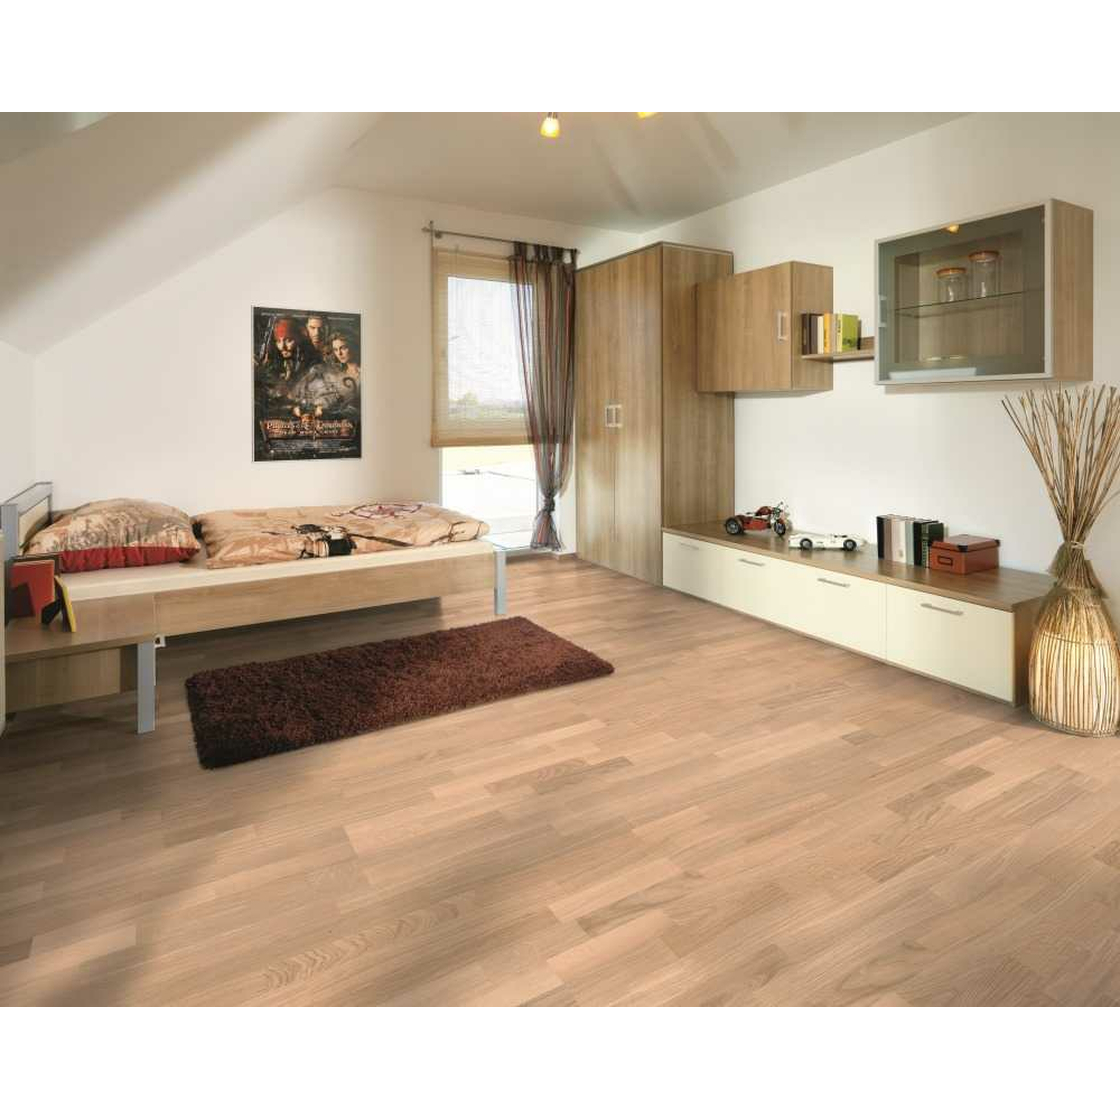 hinterseer parkett parat 190 eiche natur extra wei. Black Bedroom Furniture Sets. Home Design Ideas